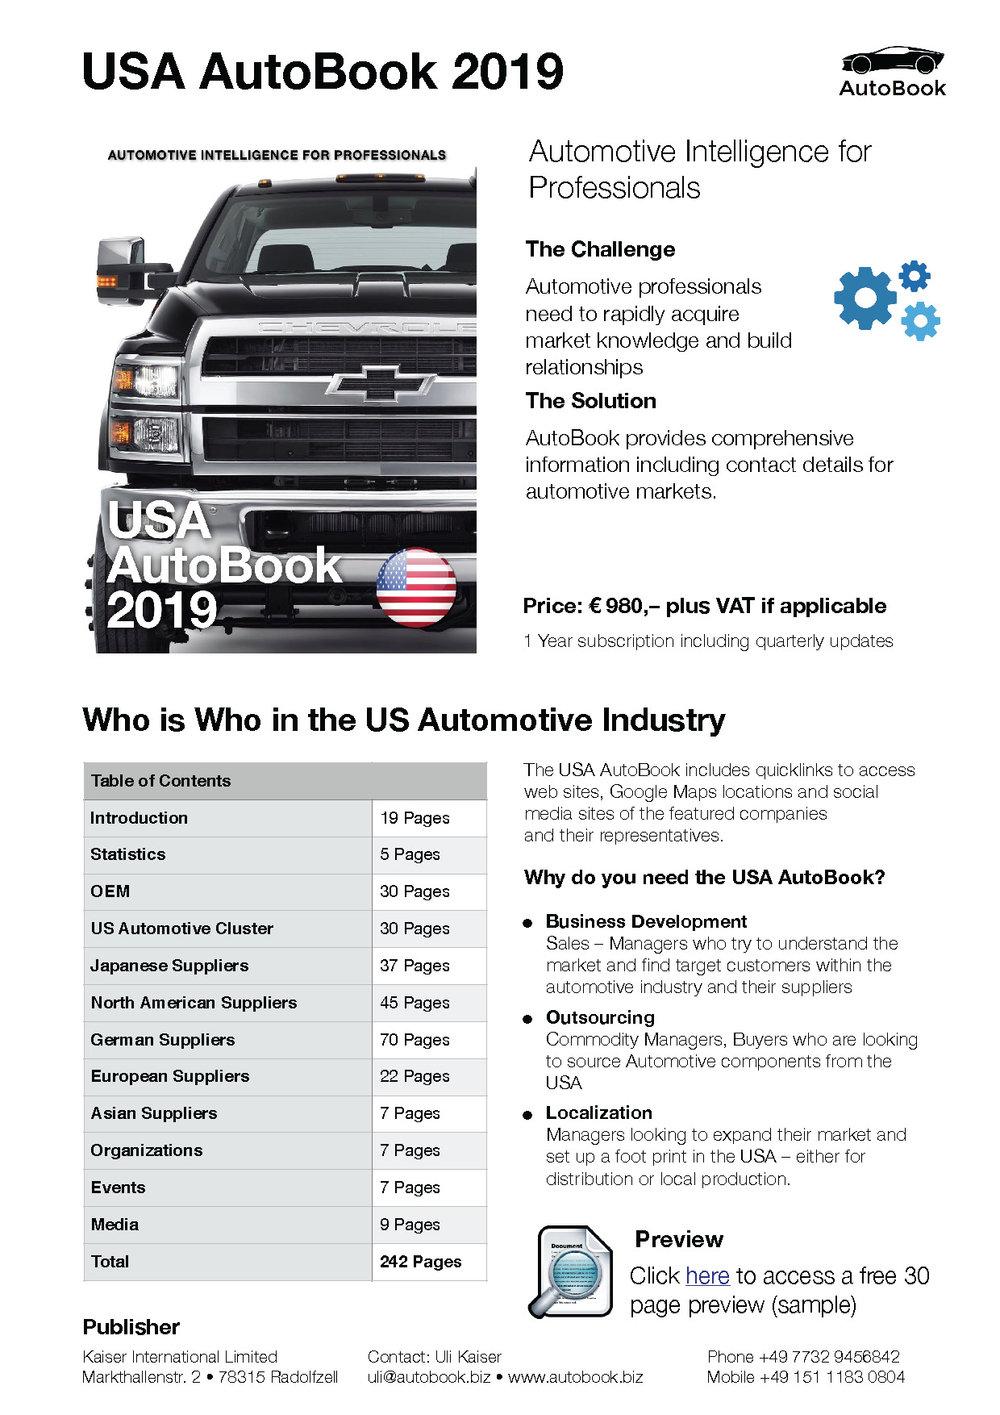 USA AutoBook 2019 Datasheet.jpg